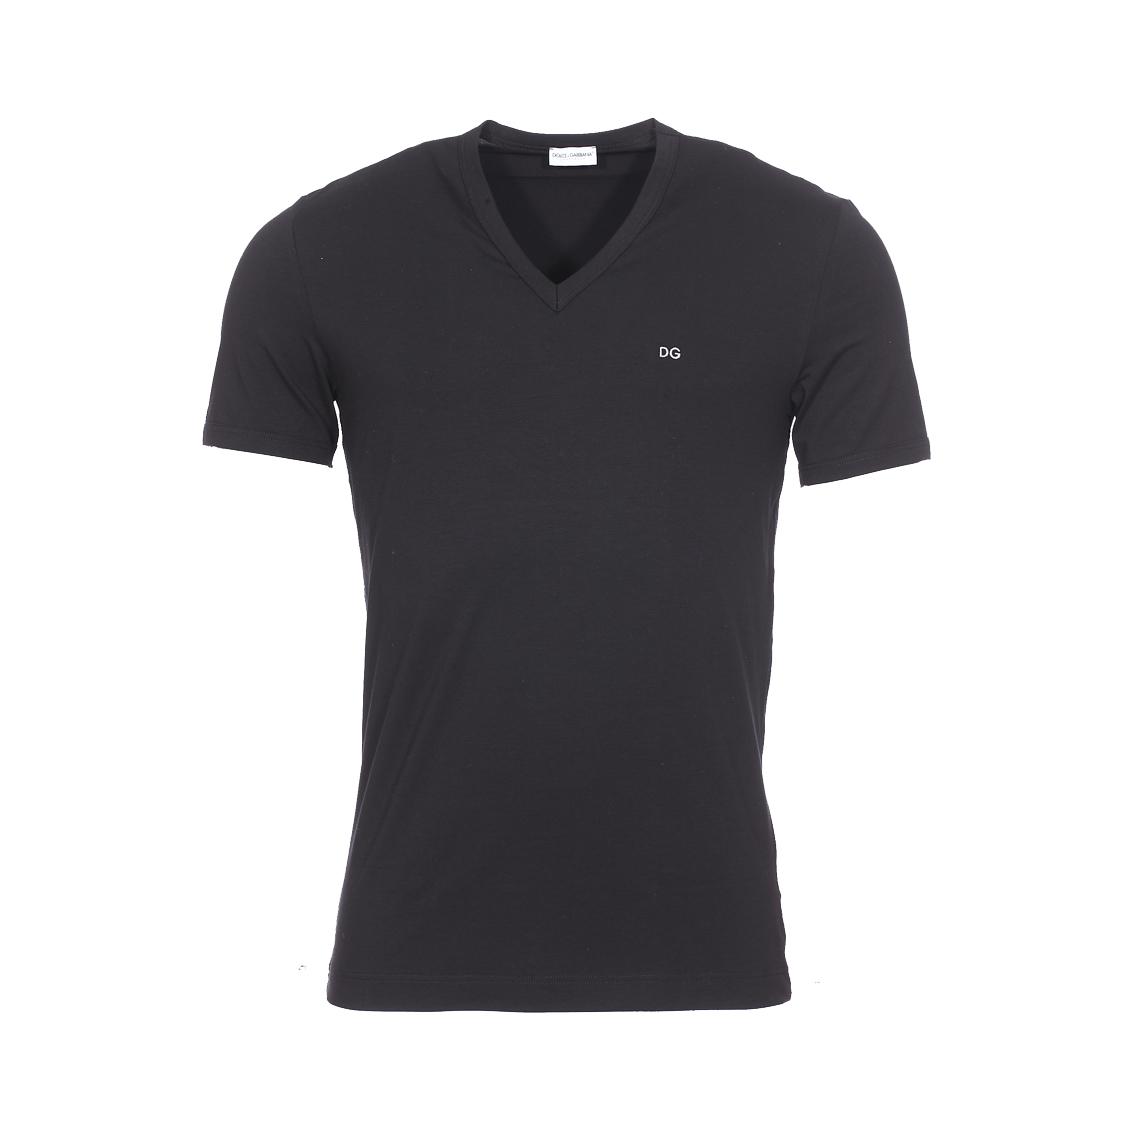 Tee-shirt col v  en coton stretch noir